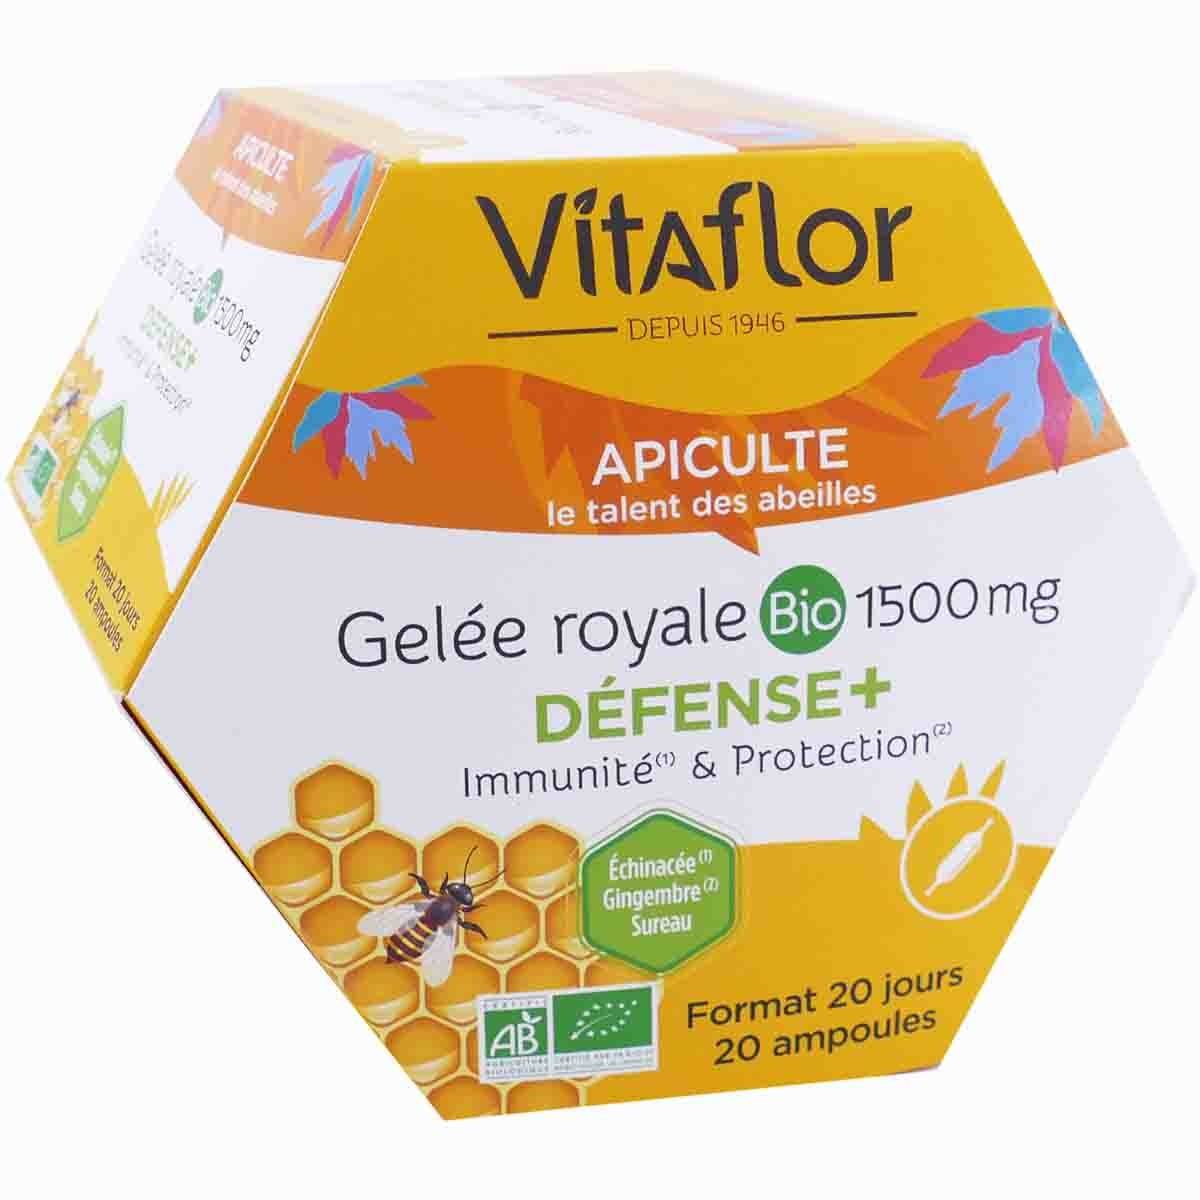 Vitaflor apicule gelee royale bio 1500mg 20 ampoules 15ml